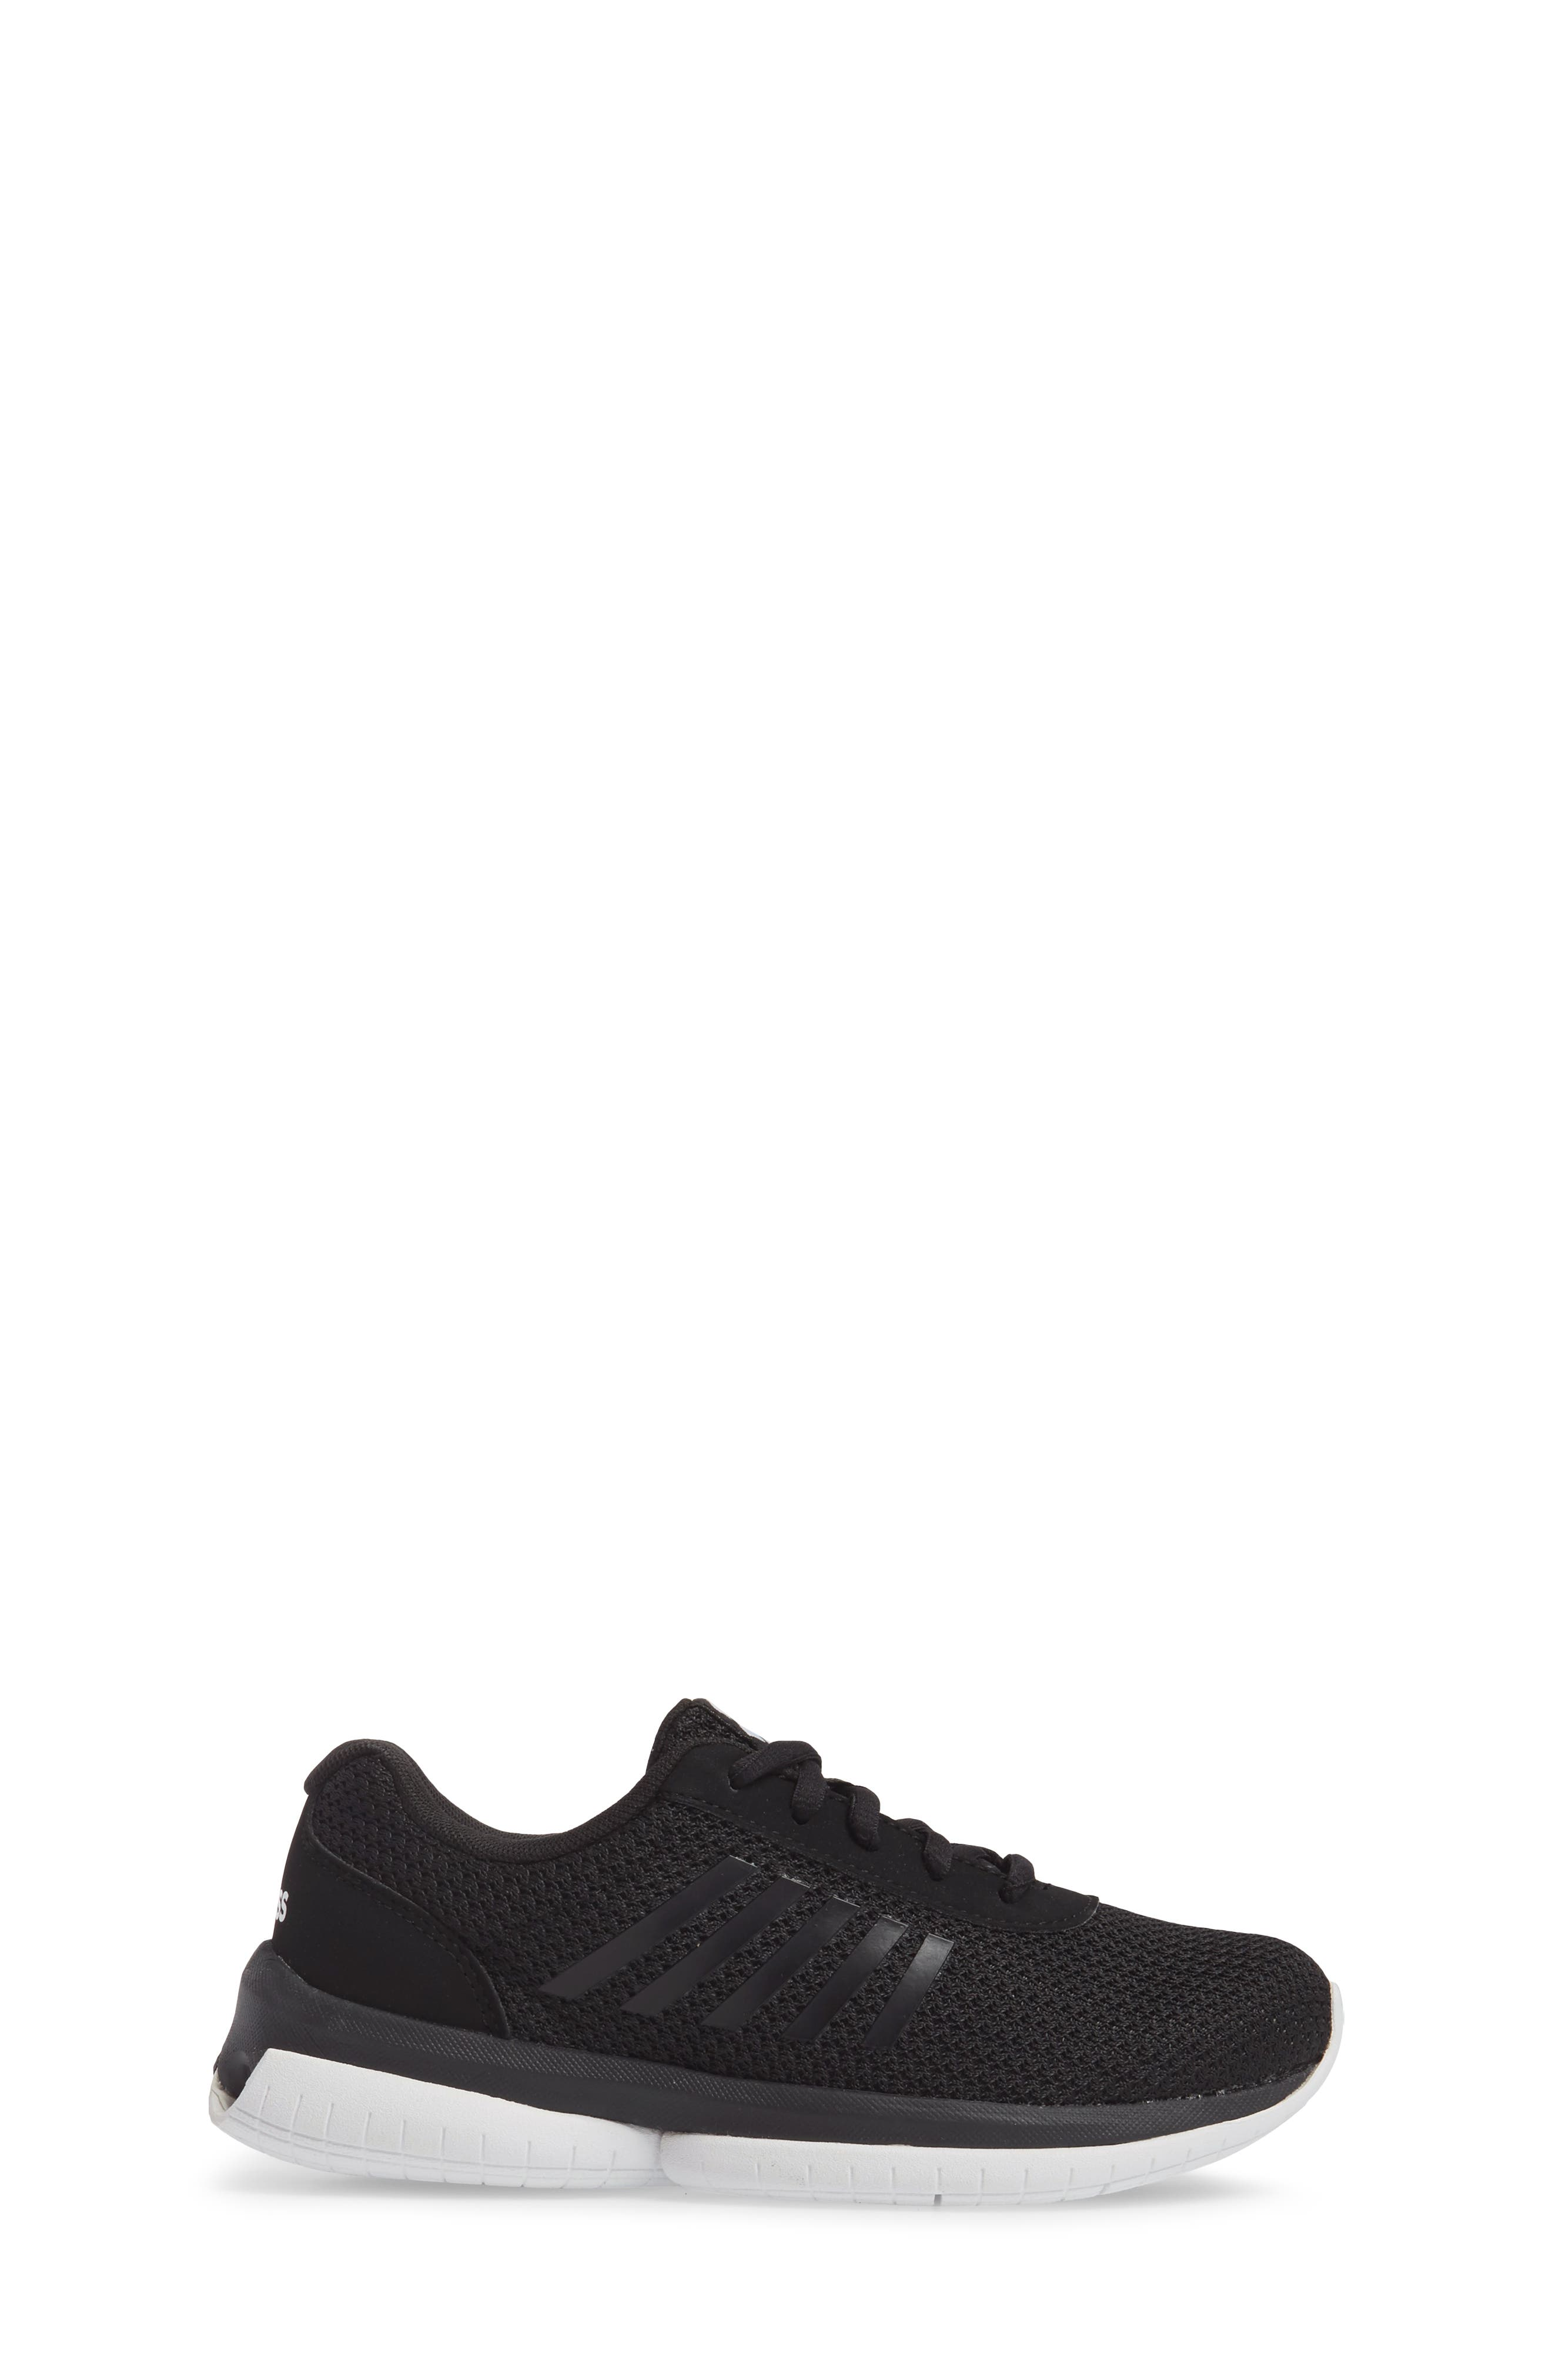 Tubes Infinity Sneaker,                             Alternate thumbnail 3, color,                             002